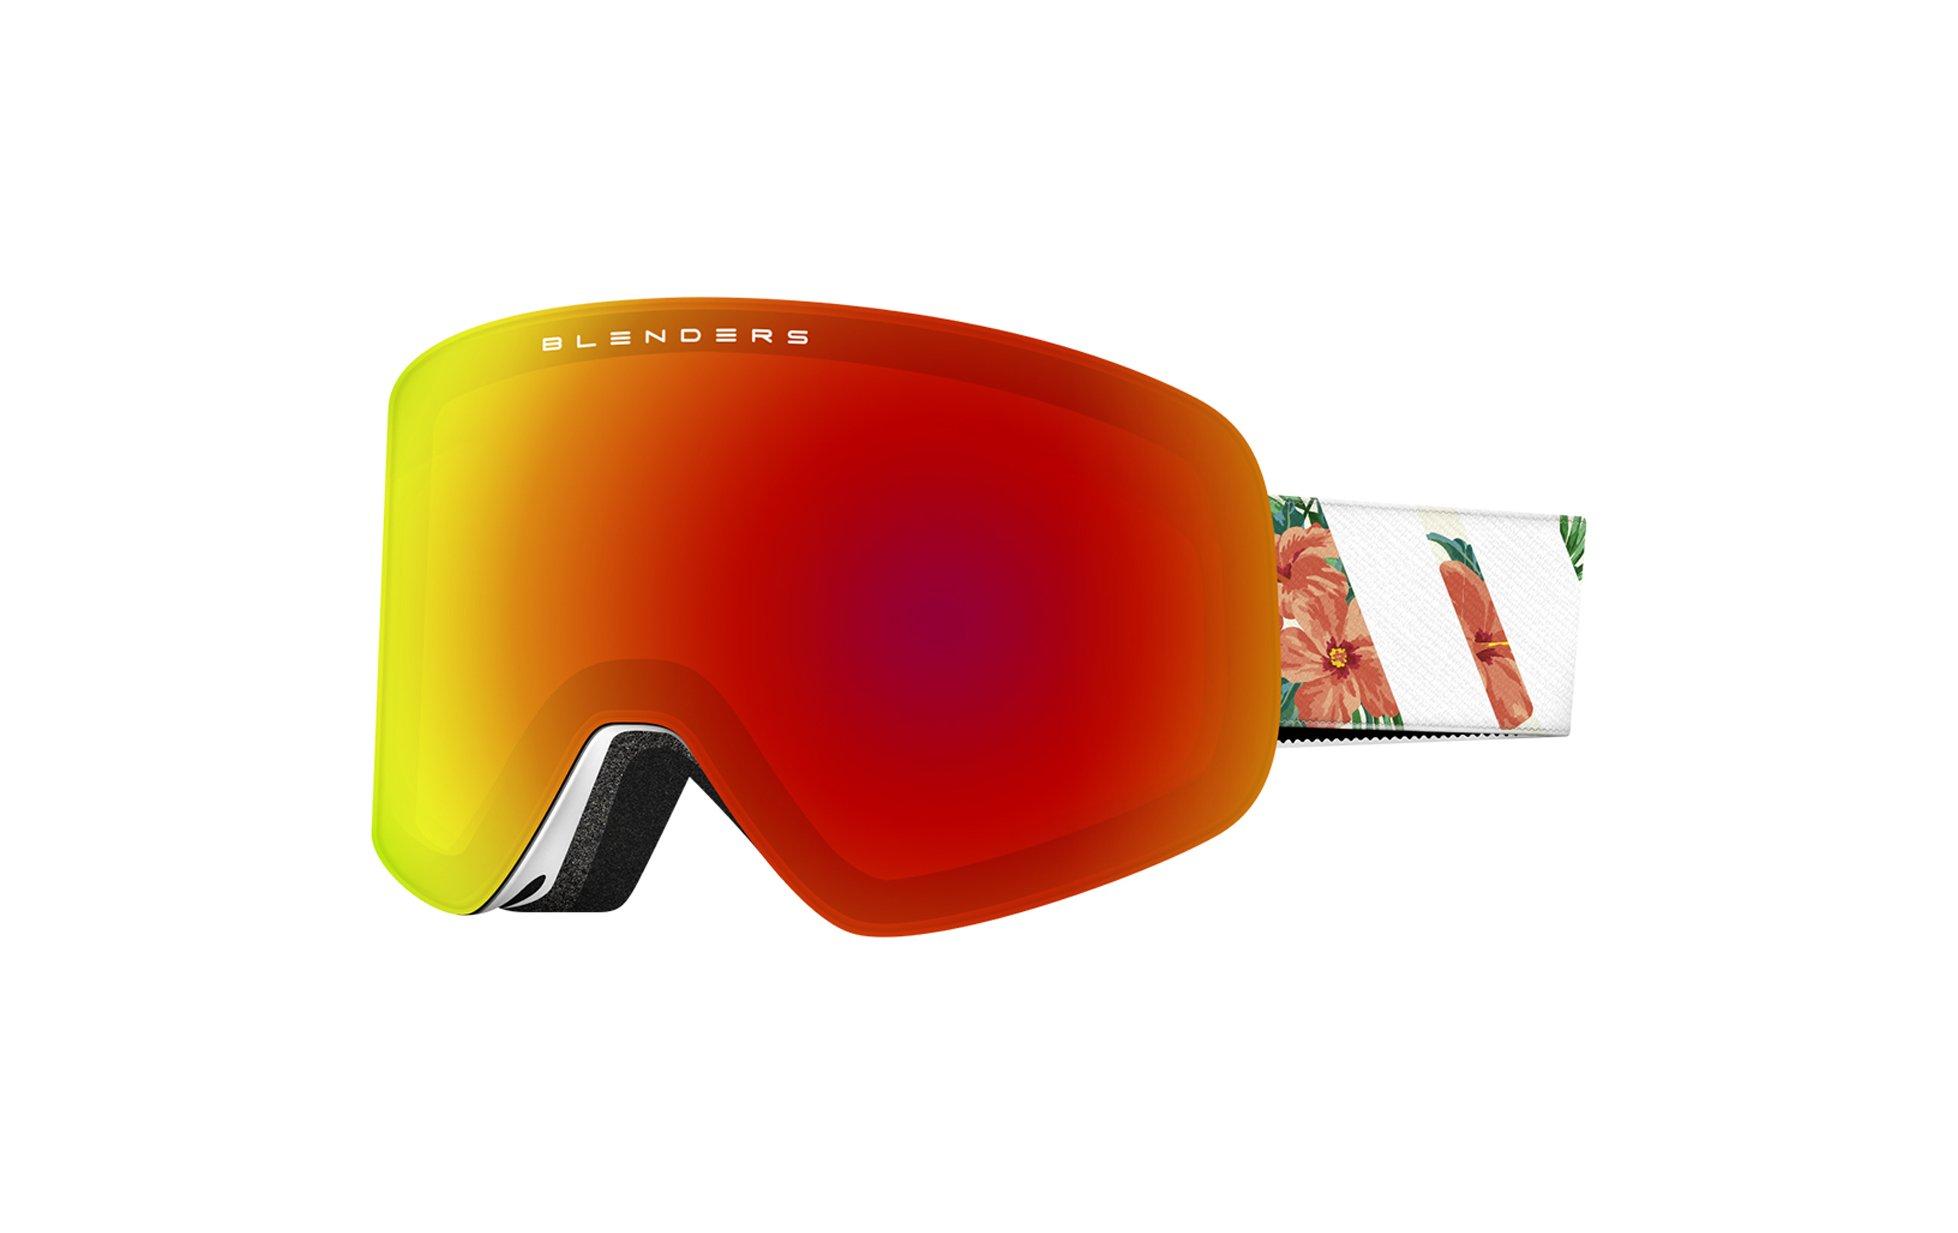 195d841889 Blenders Eyewear Ski Goggles - eyewear near me